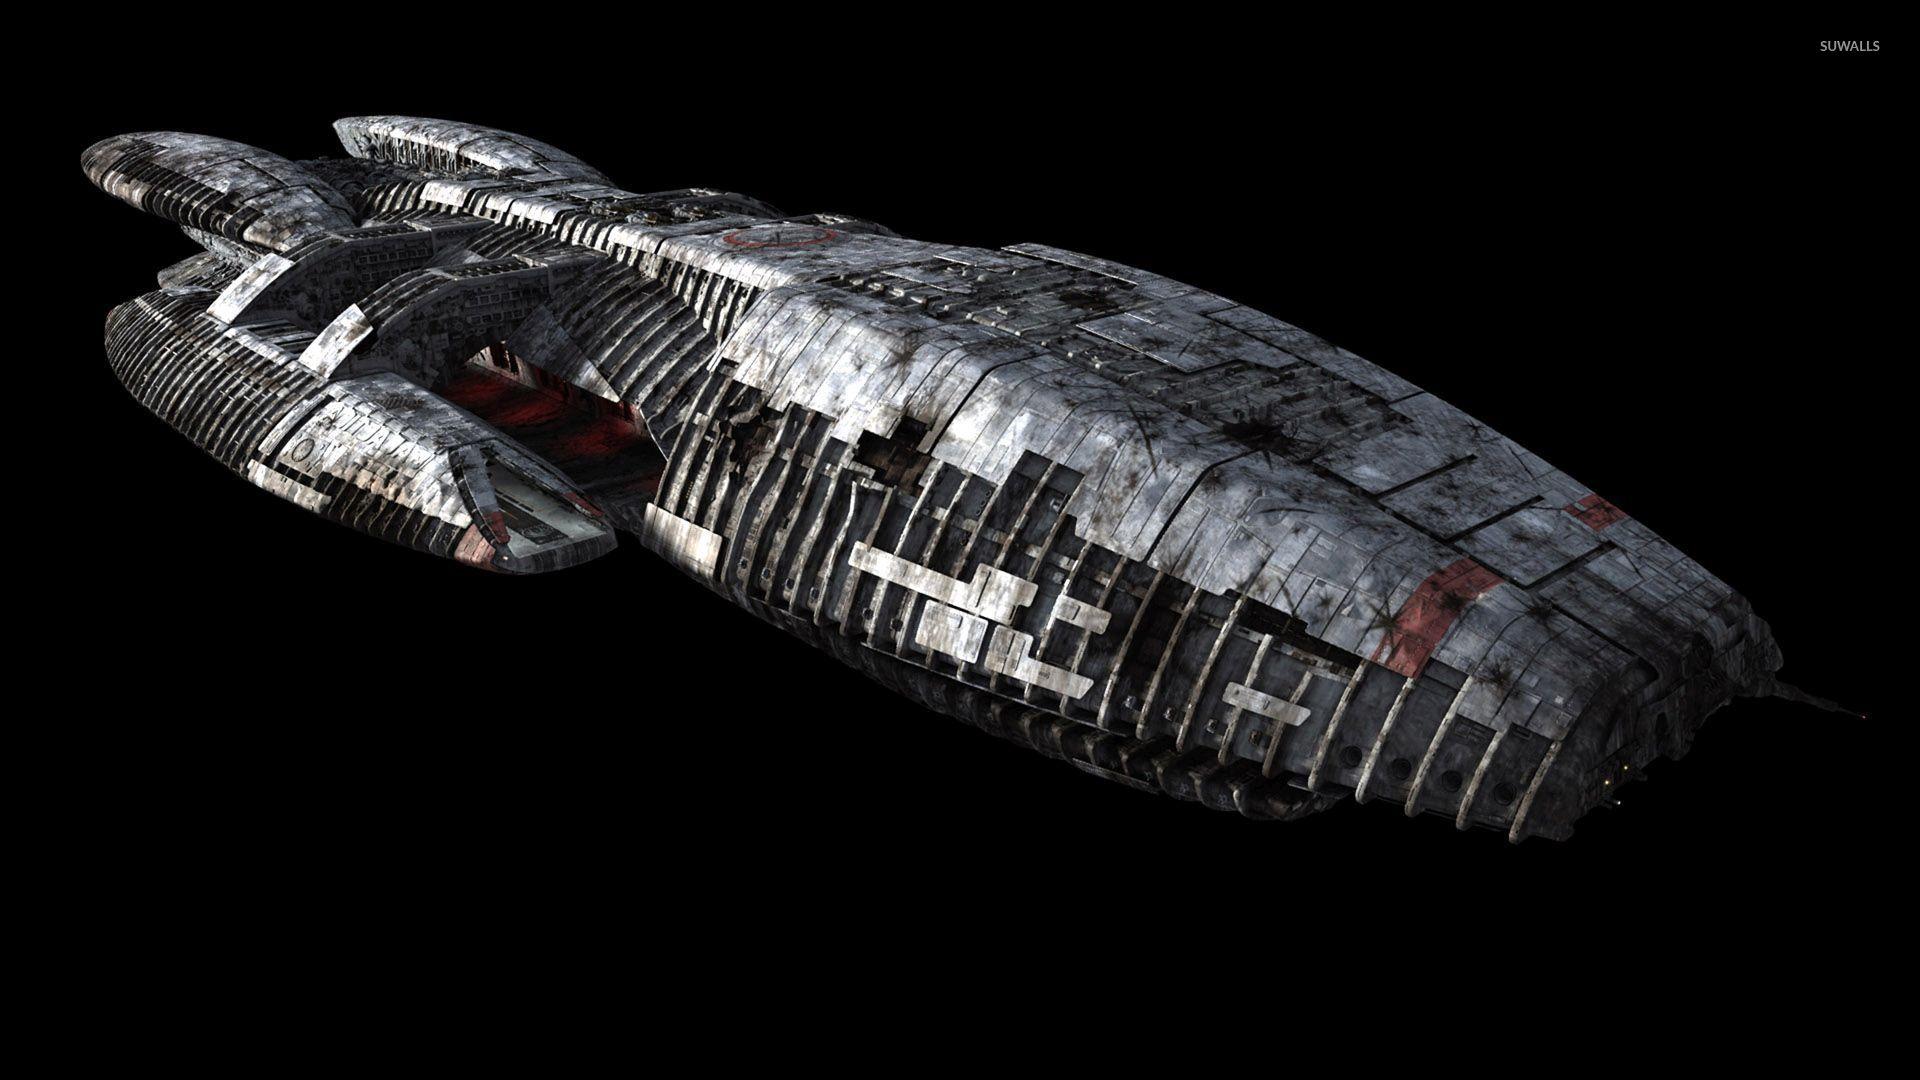 Battlestar Galactica Spaceship Wallpaper